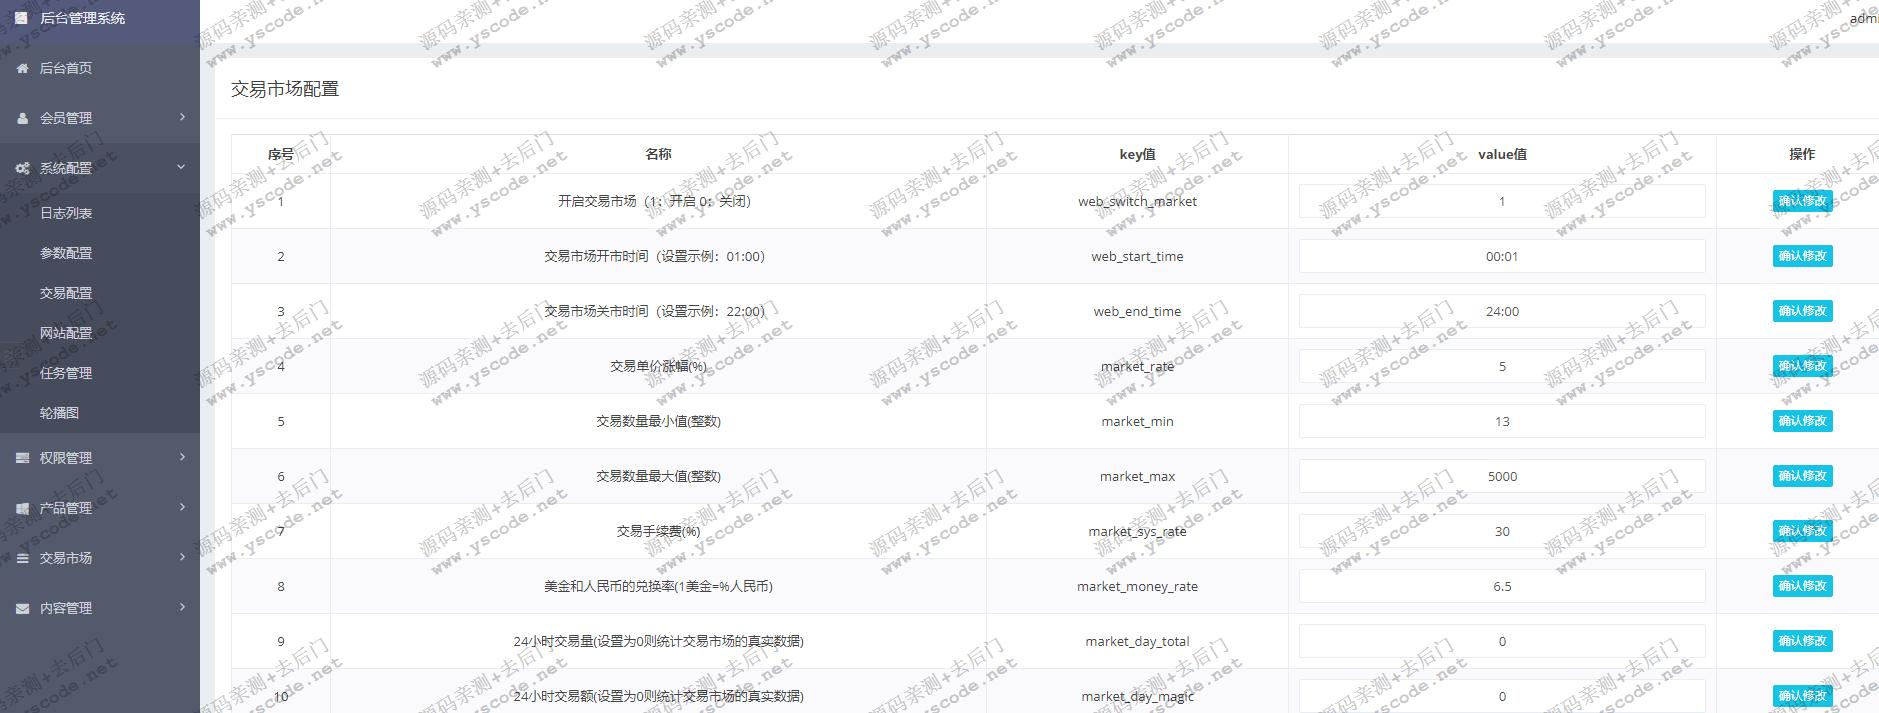 Thinkphp5区块链+挖矿,数字资产,运营级矿机市场完整开源(已测试)插图7